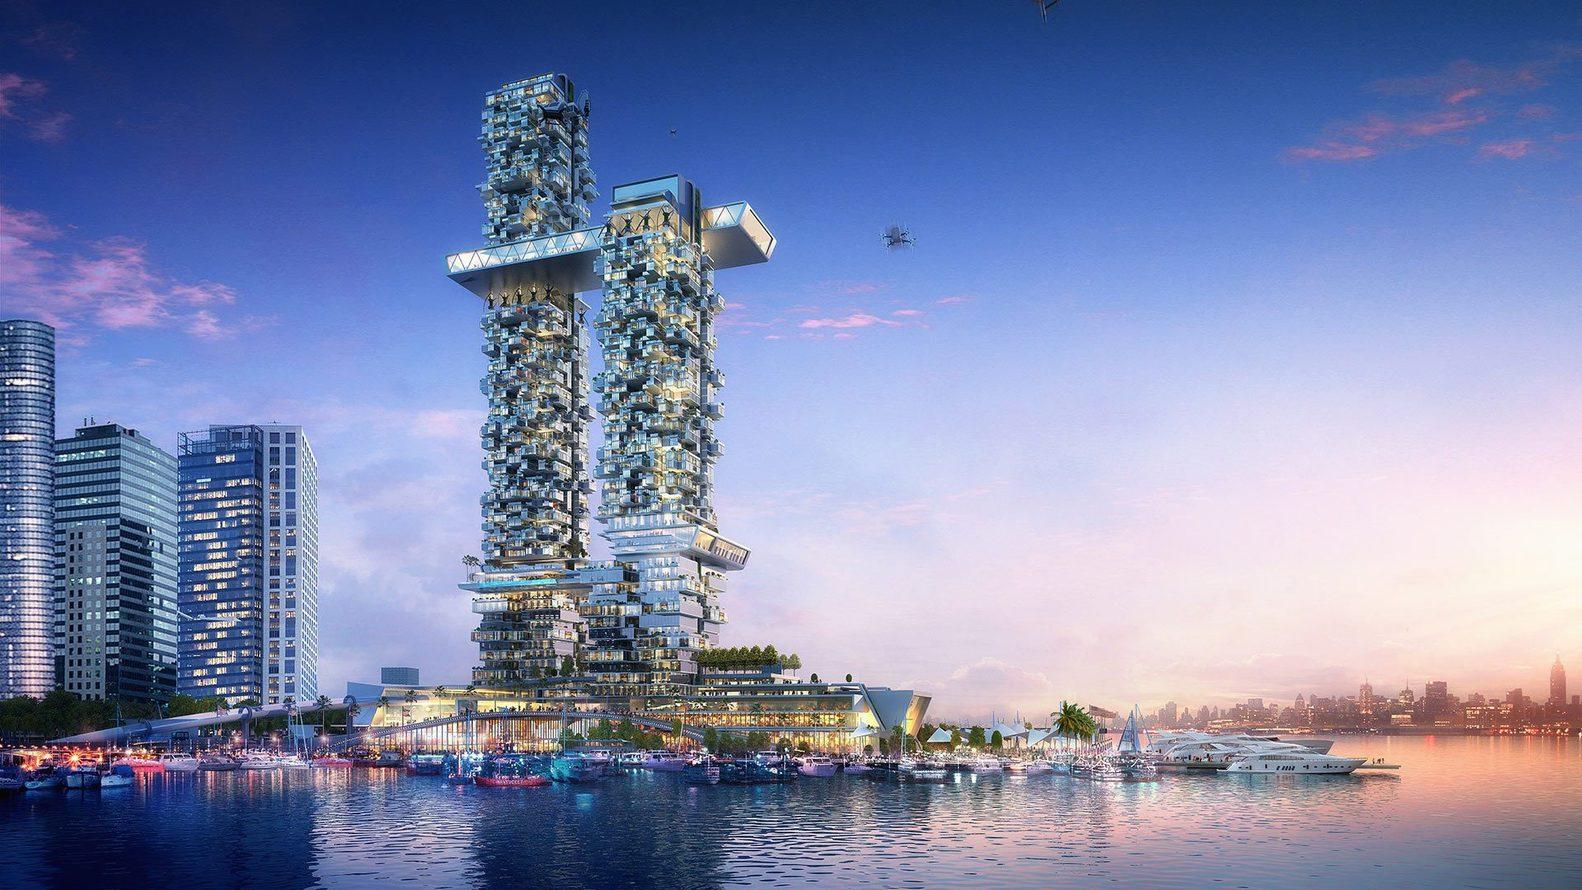 Humphreys-Partners-Architects-Pier2-AOTF-Tower-View-2-Rendering-nkwaszvlzk5mutb9yvmys324lvfhr83i9cmx8wh4ao